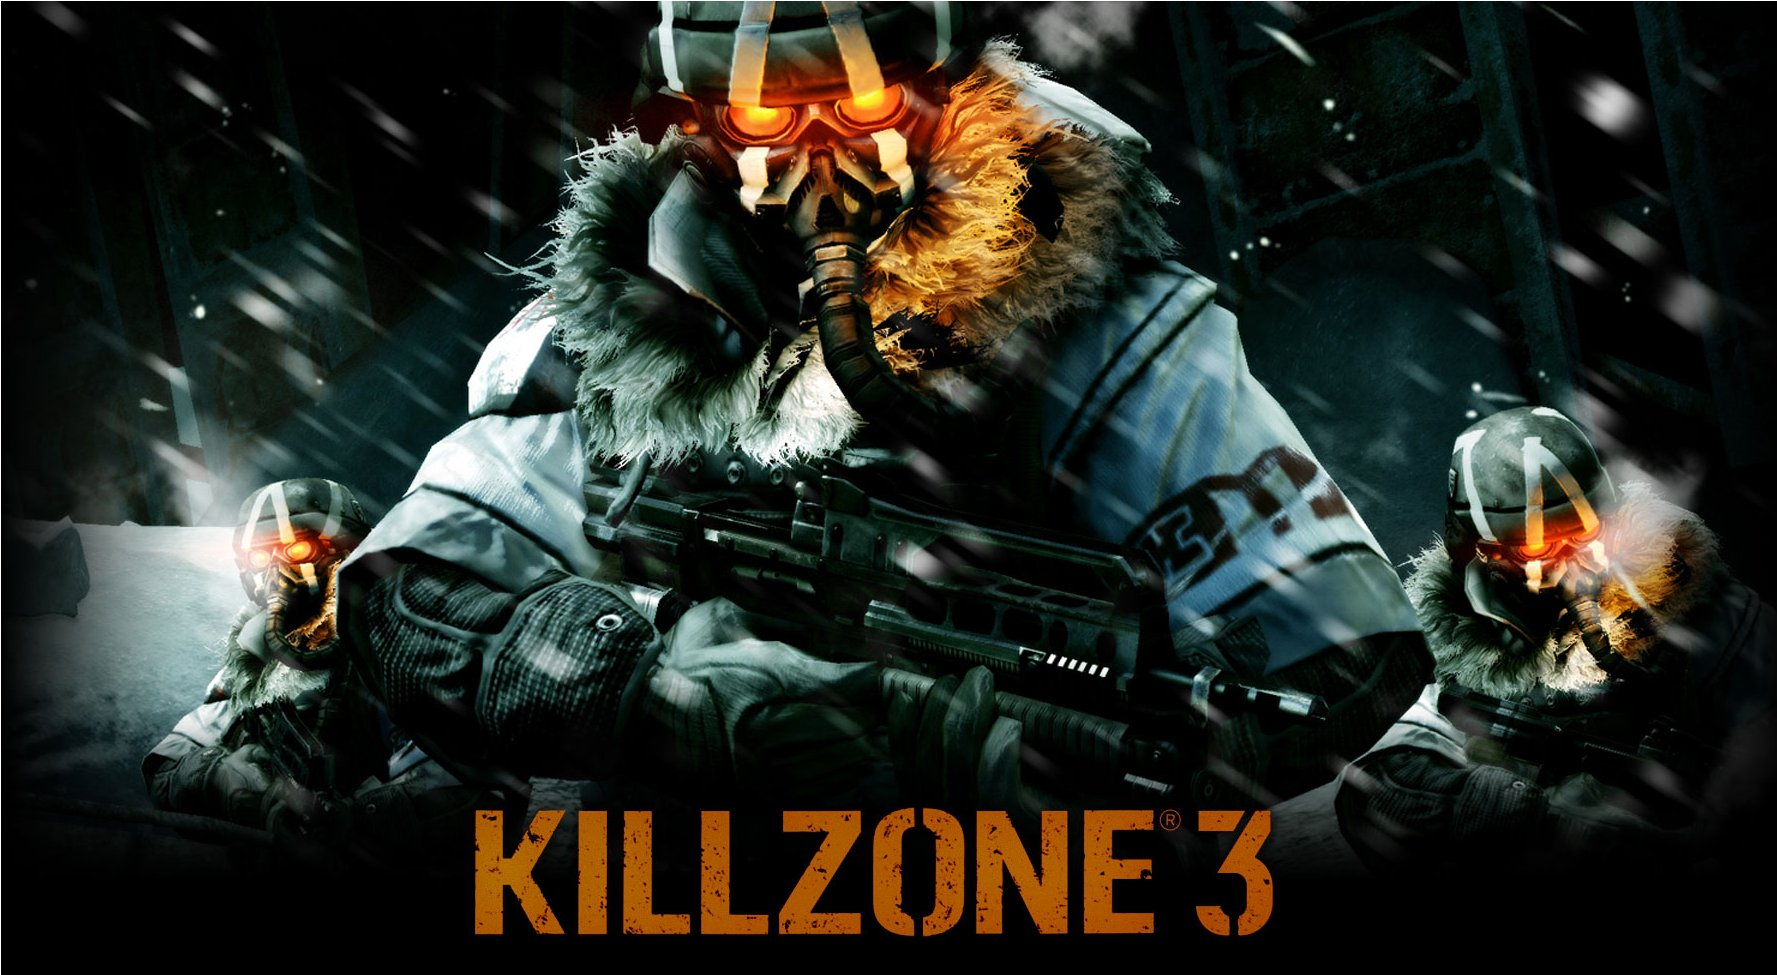 Killzone 3 : du gameplay en vidéo